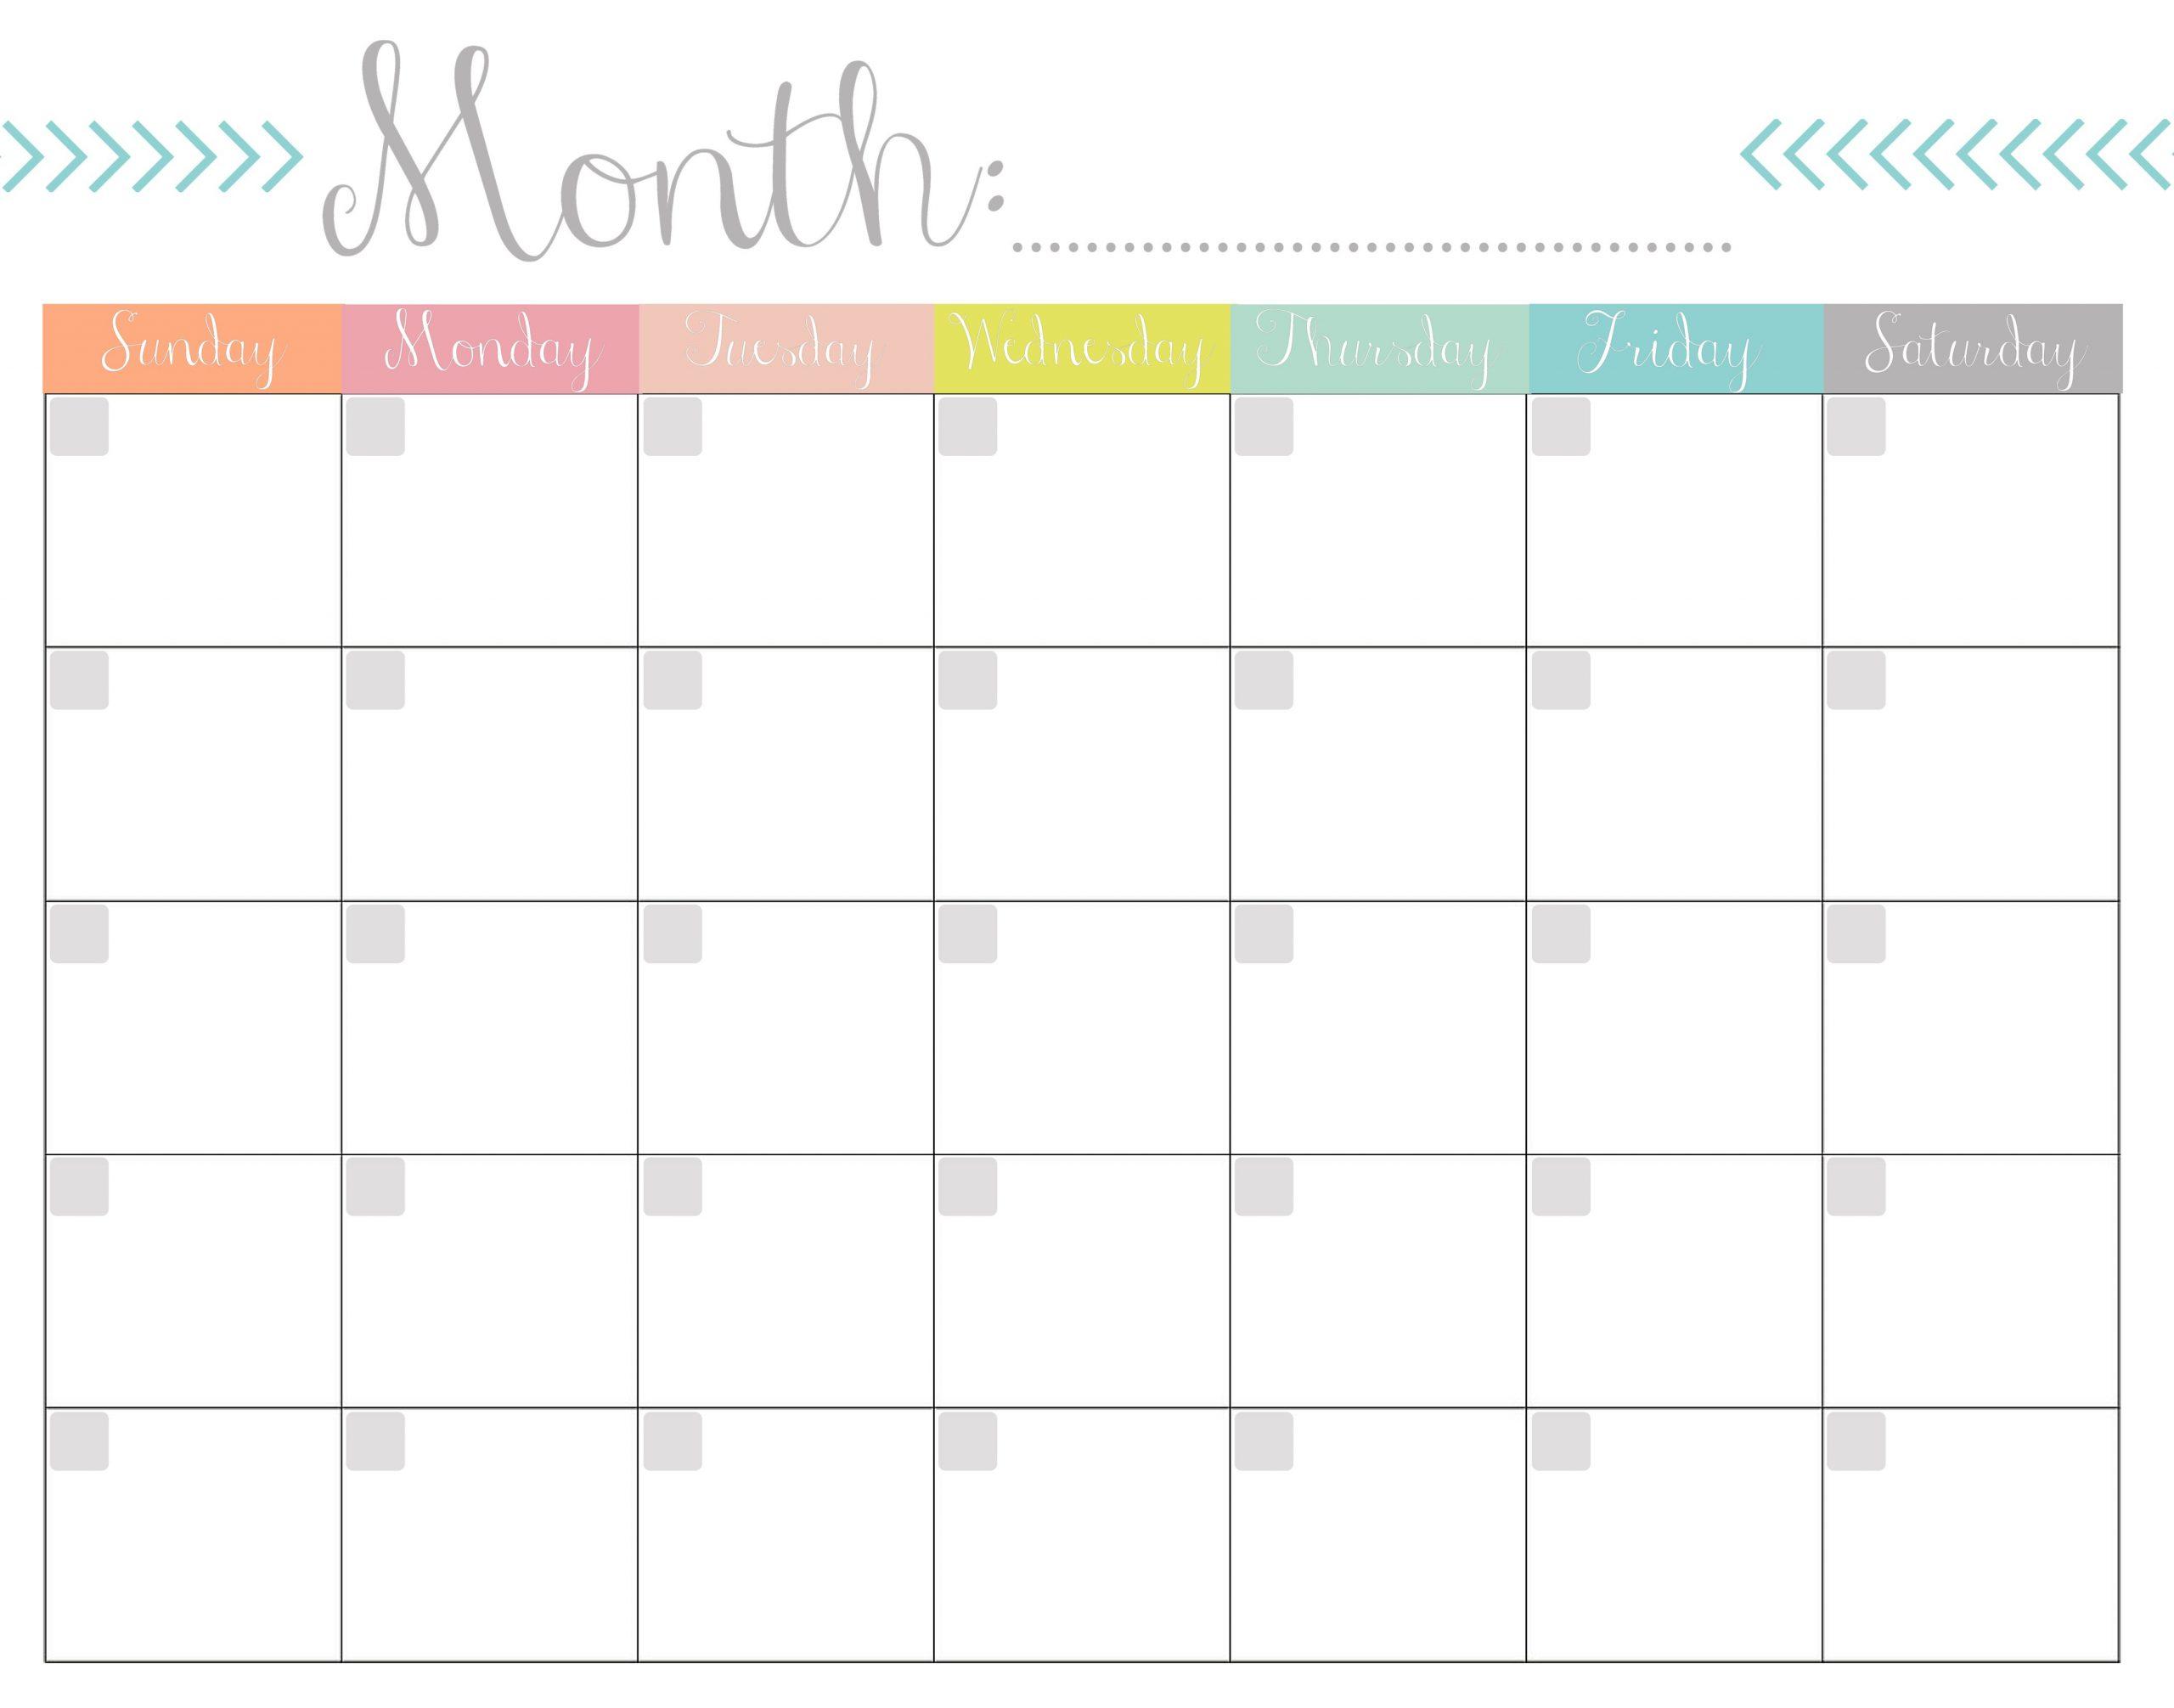 Importance Of Pre Booking – Phoenix, A Salon Printale Calendar Fill In